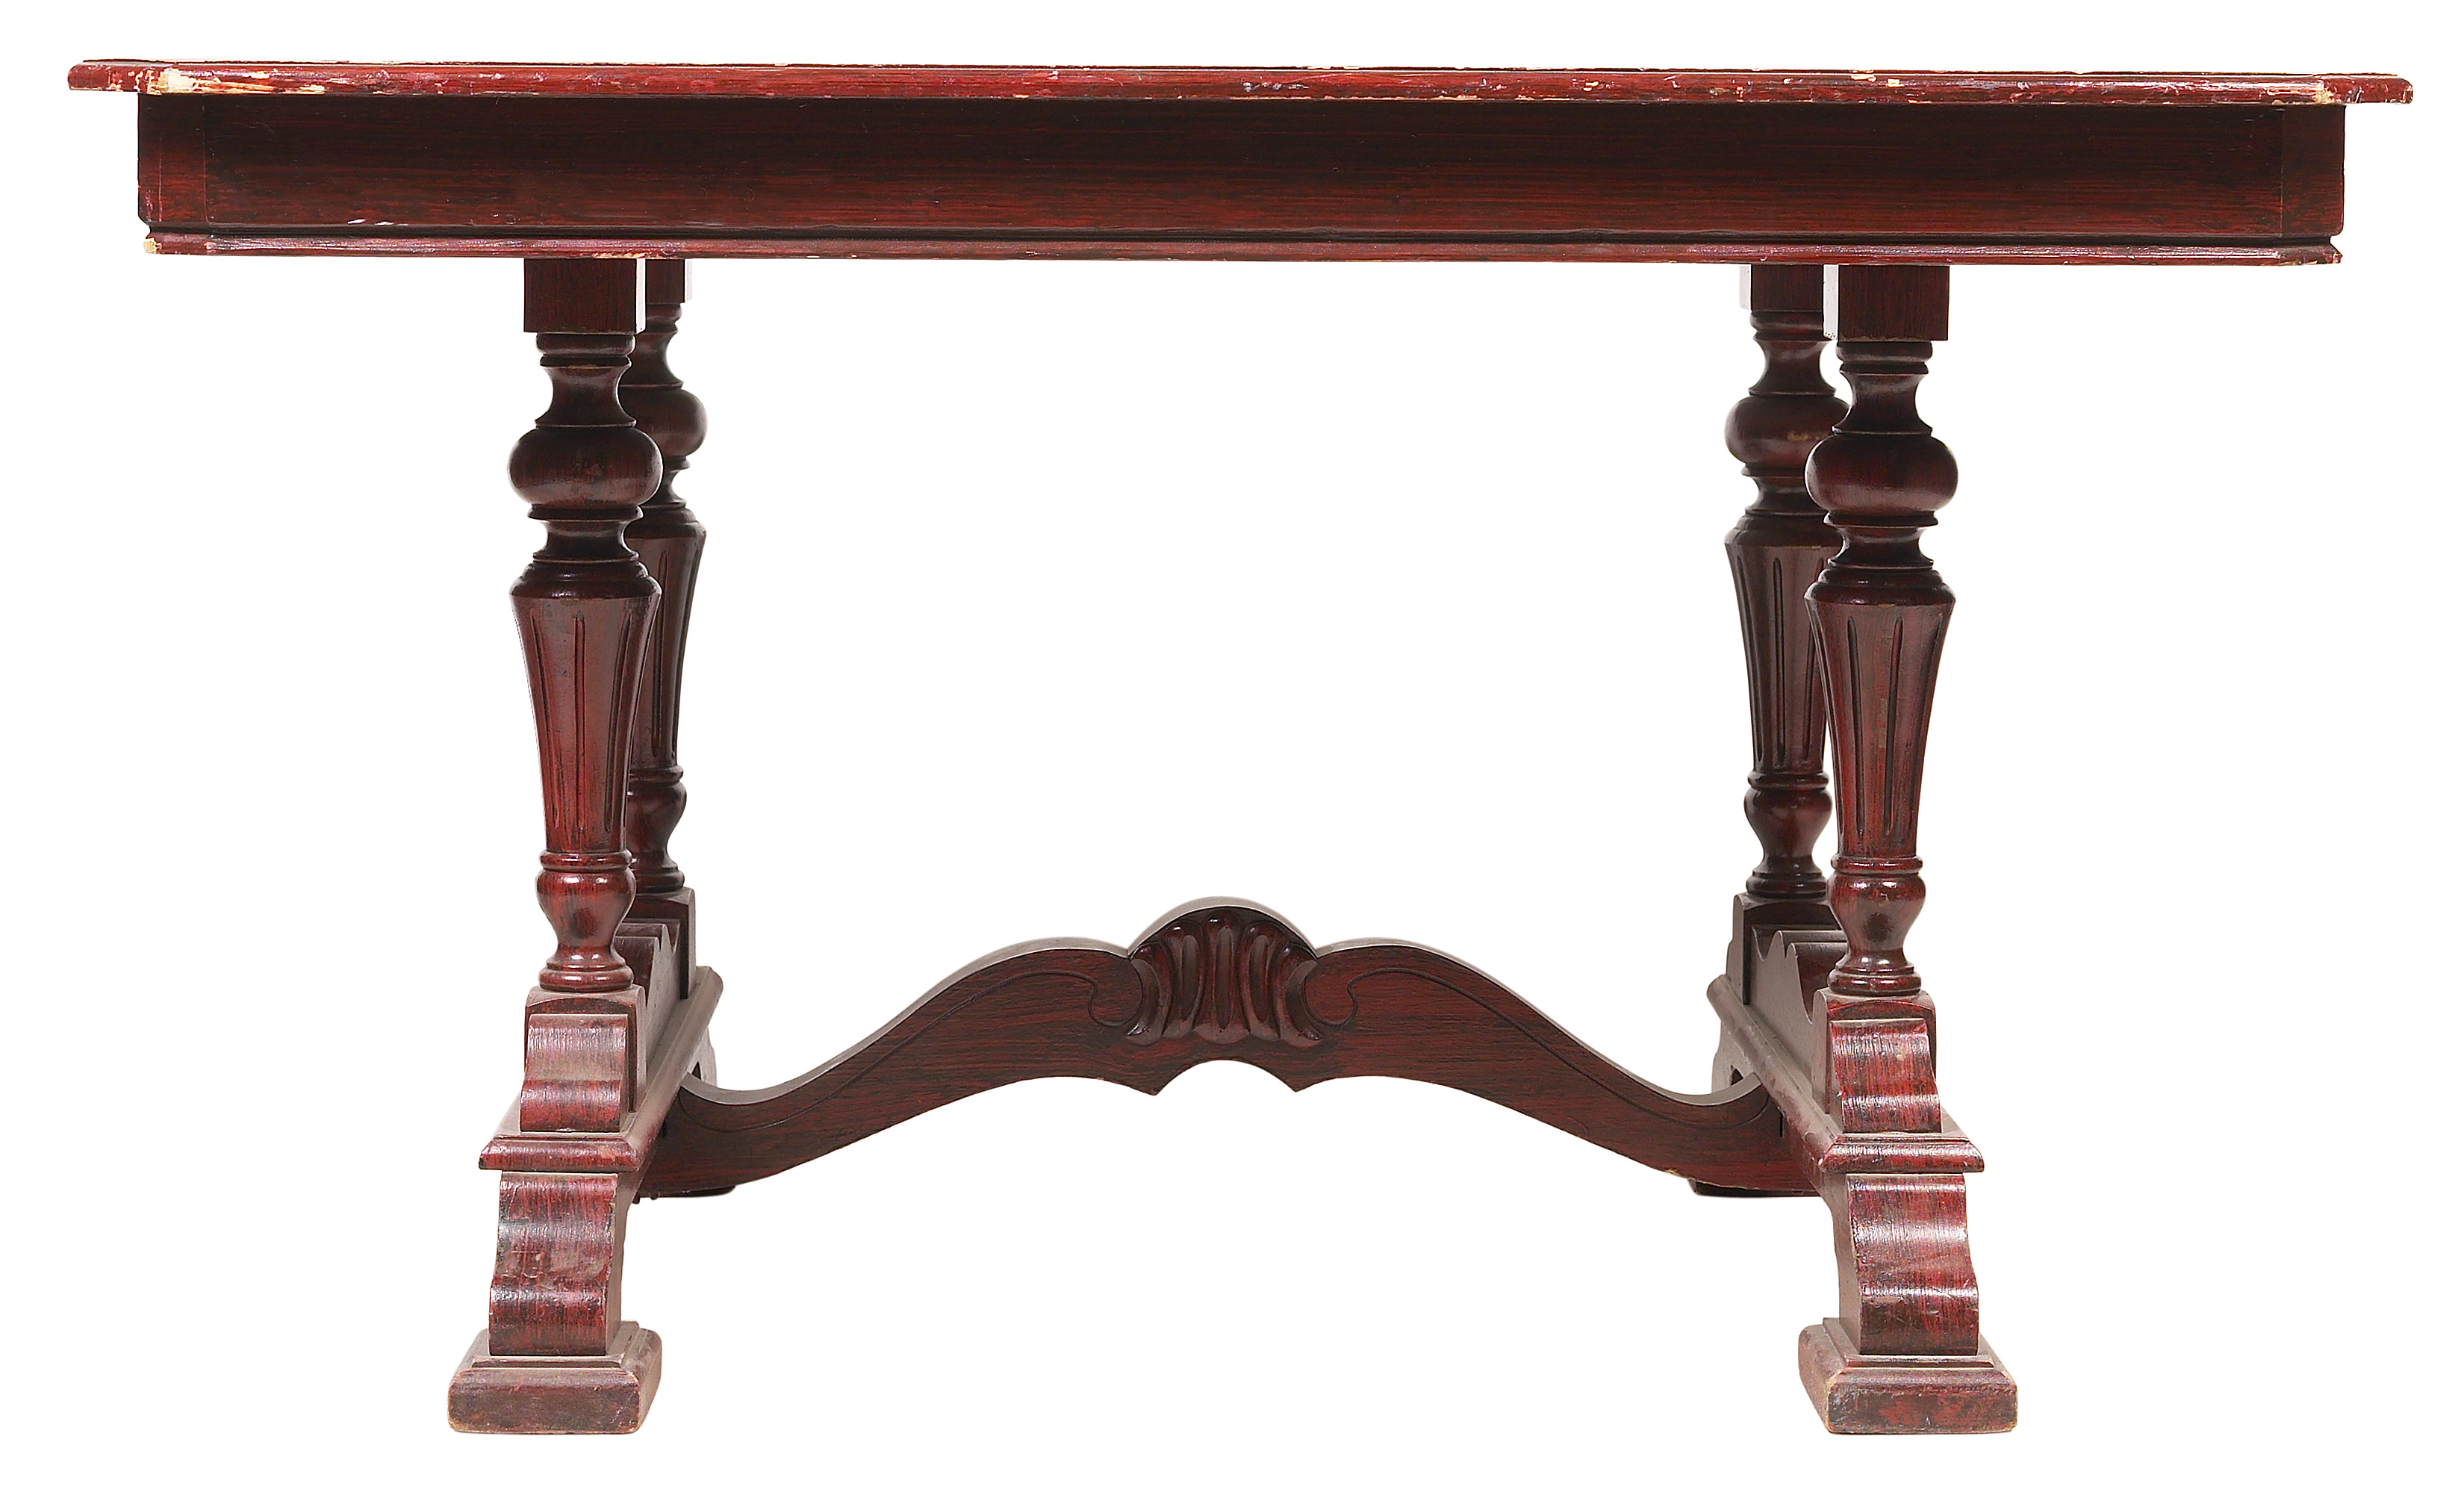 Como Limpiar Muebles De Madera Antiguos Best Cmo Limpiar Muebles  ~ Como Limpiar Muebles De Madera Antiguos